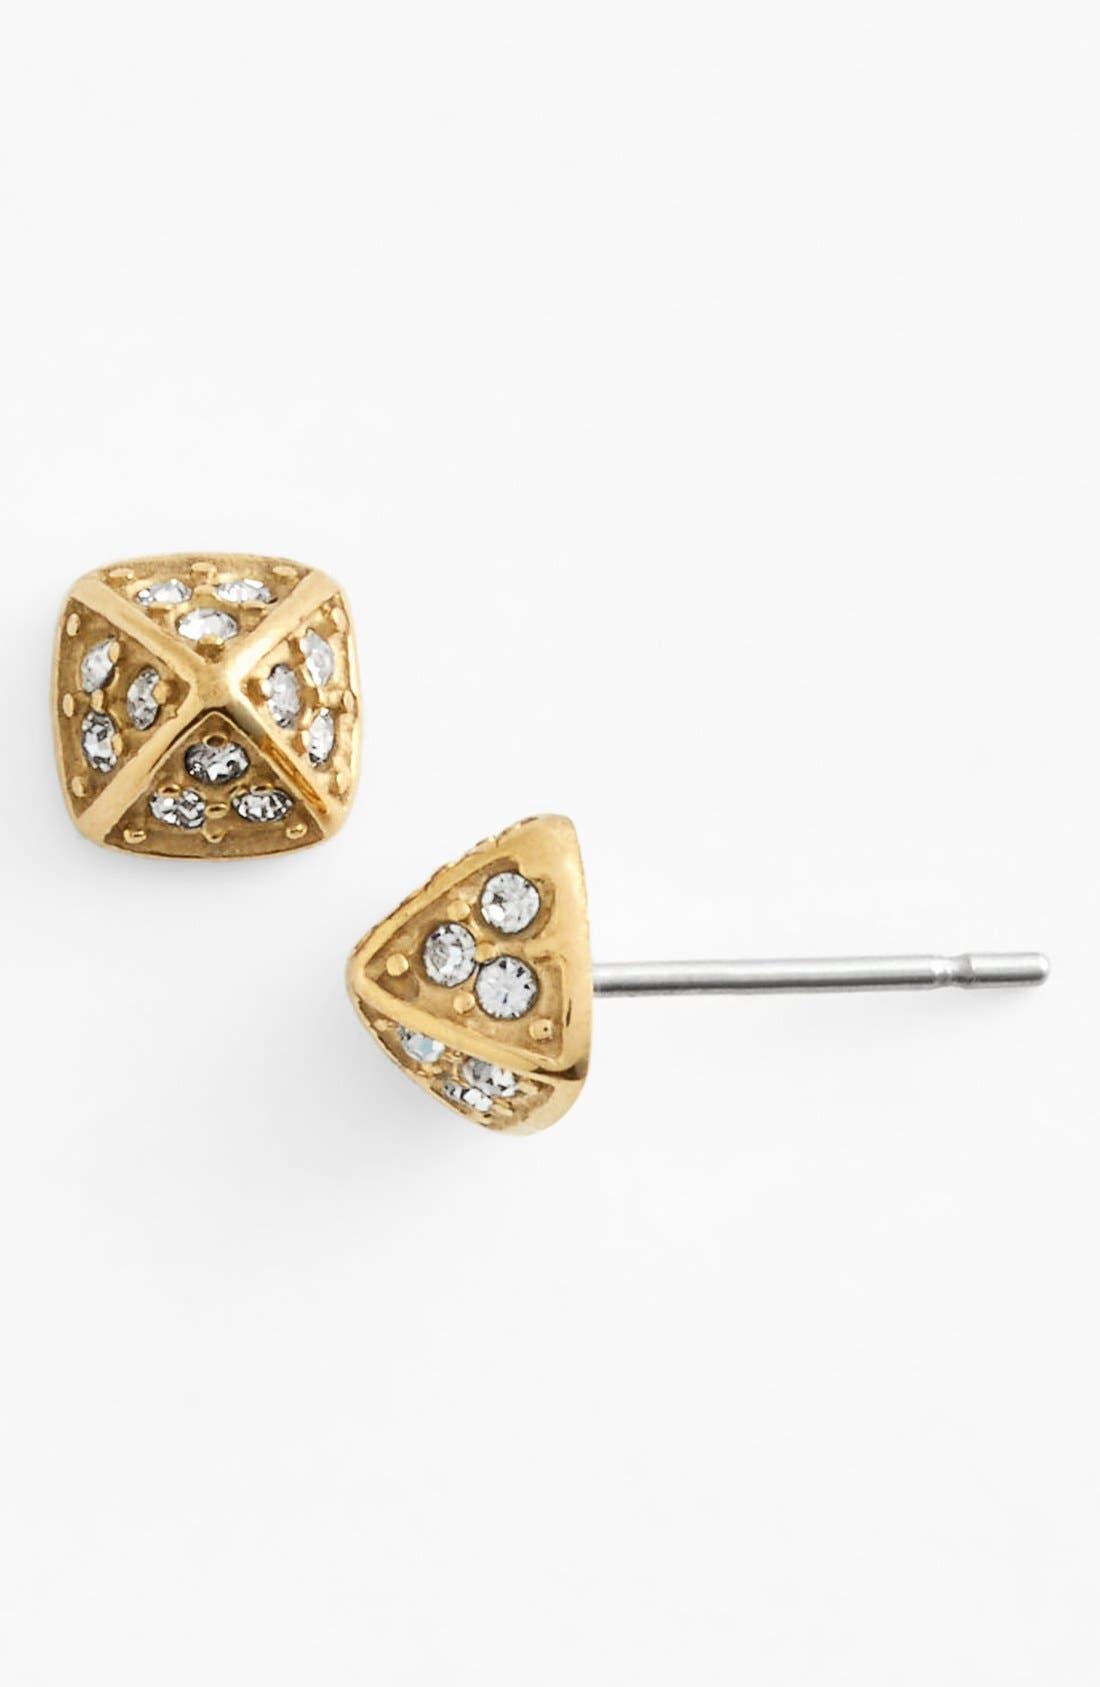 Main Image - Rebecca Minkoff 'Jewel Box' Pavé Pyramid Stud Earrings